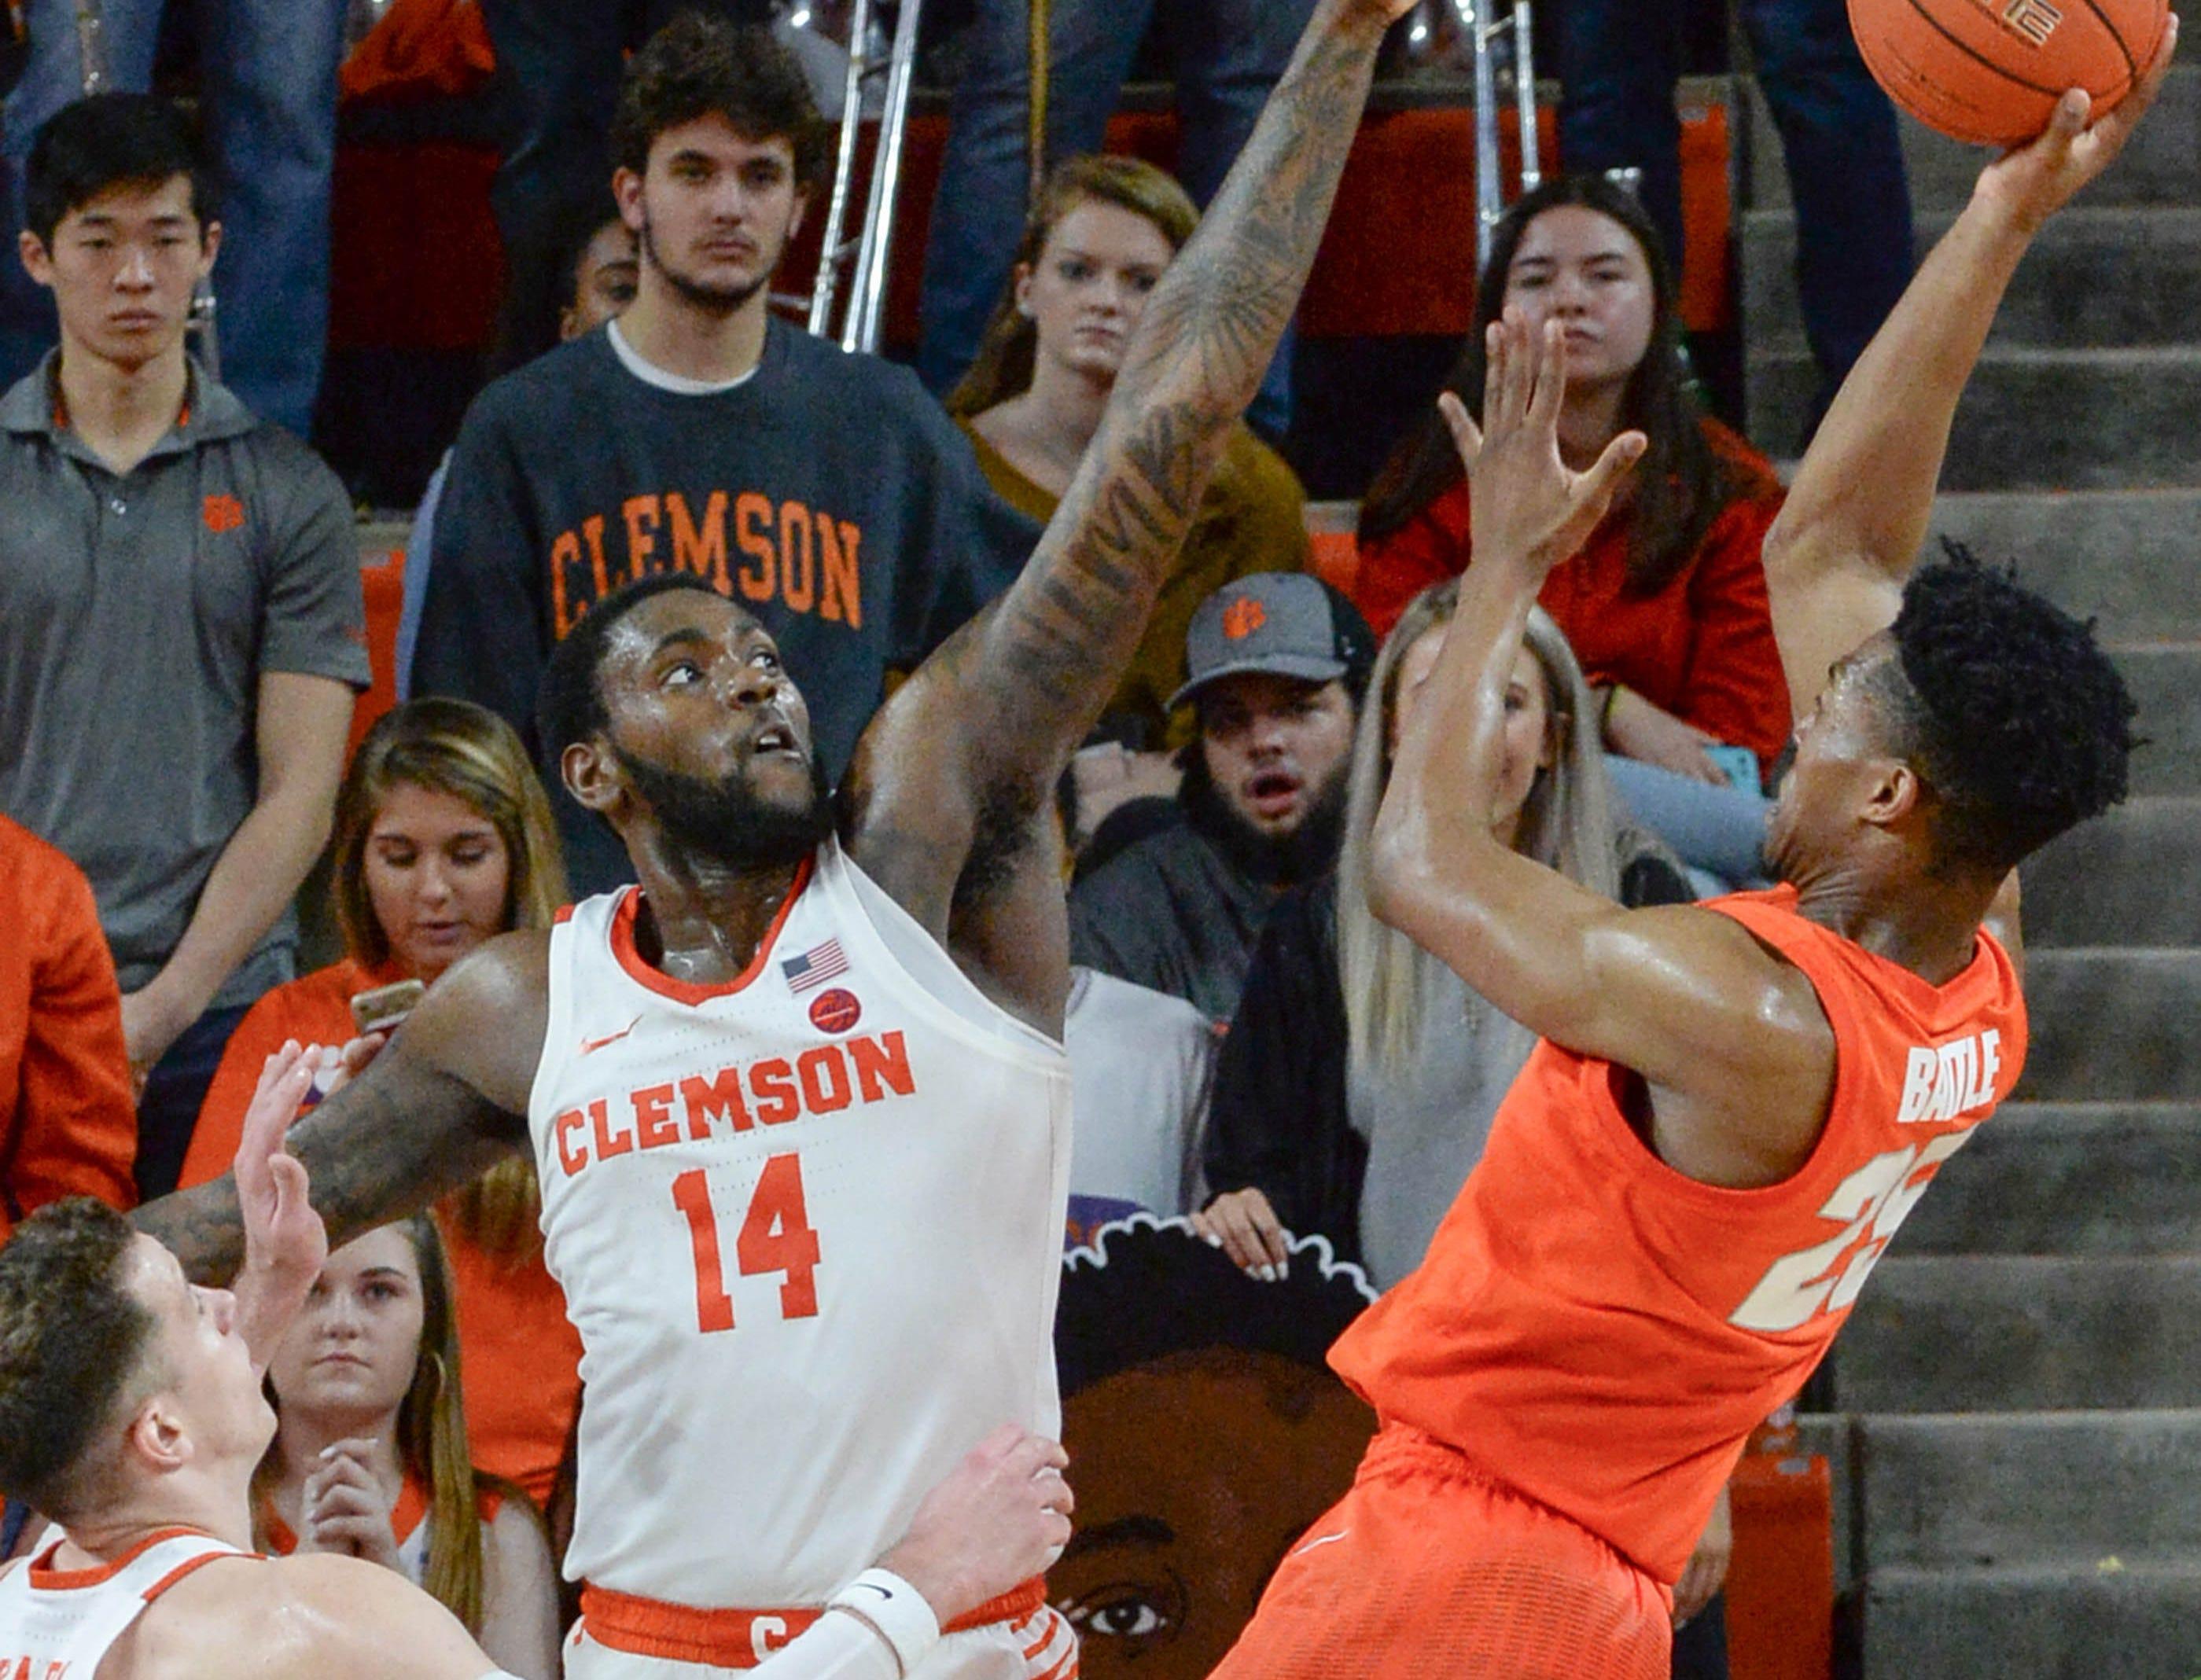 Clemson forward Elijah Thomas (14) pressures Syracuse guard Tyus Battle(25) during the second half in Littlejohn Coliseum in Clemson Saturday, March 9, 2019.